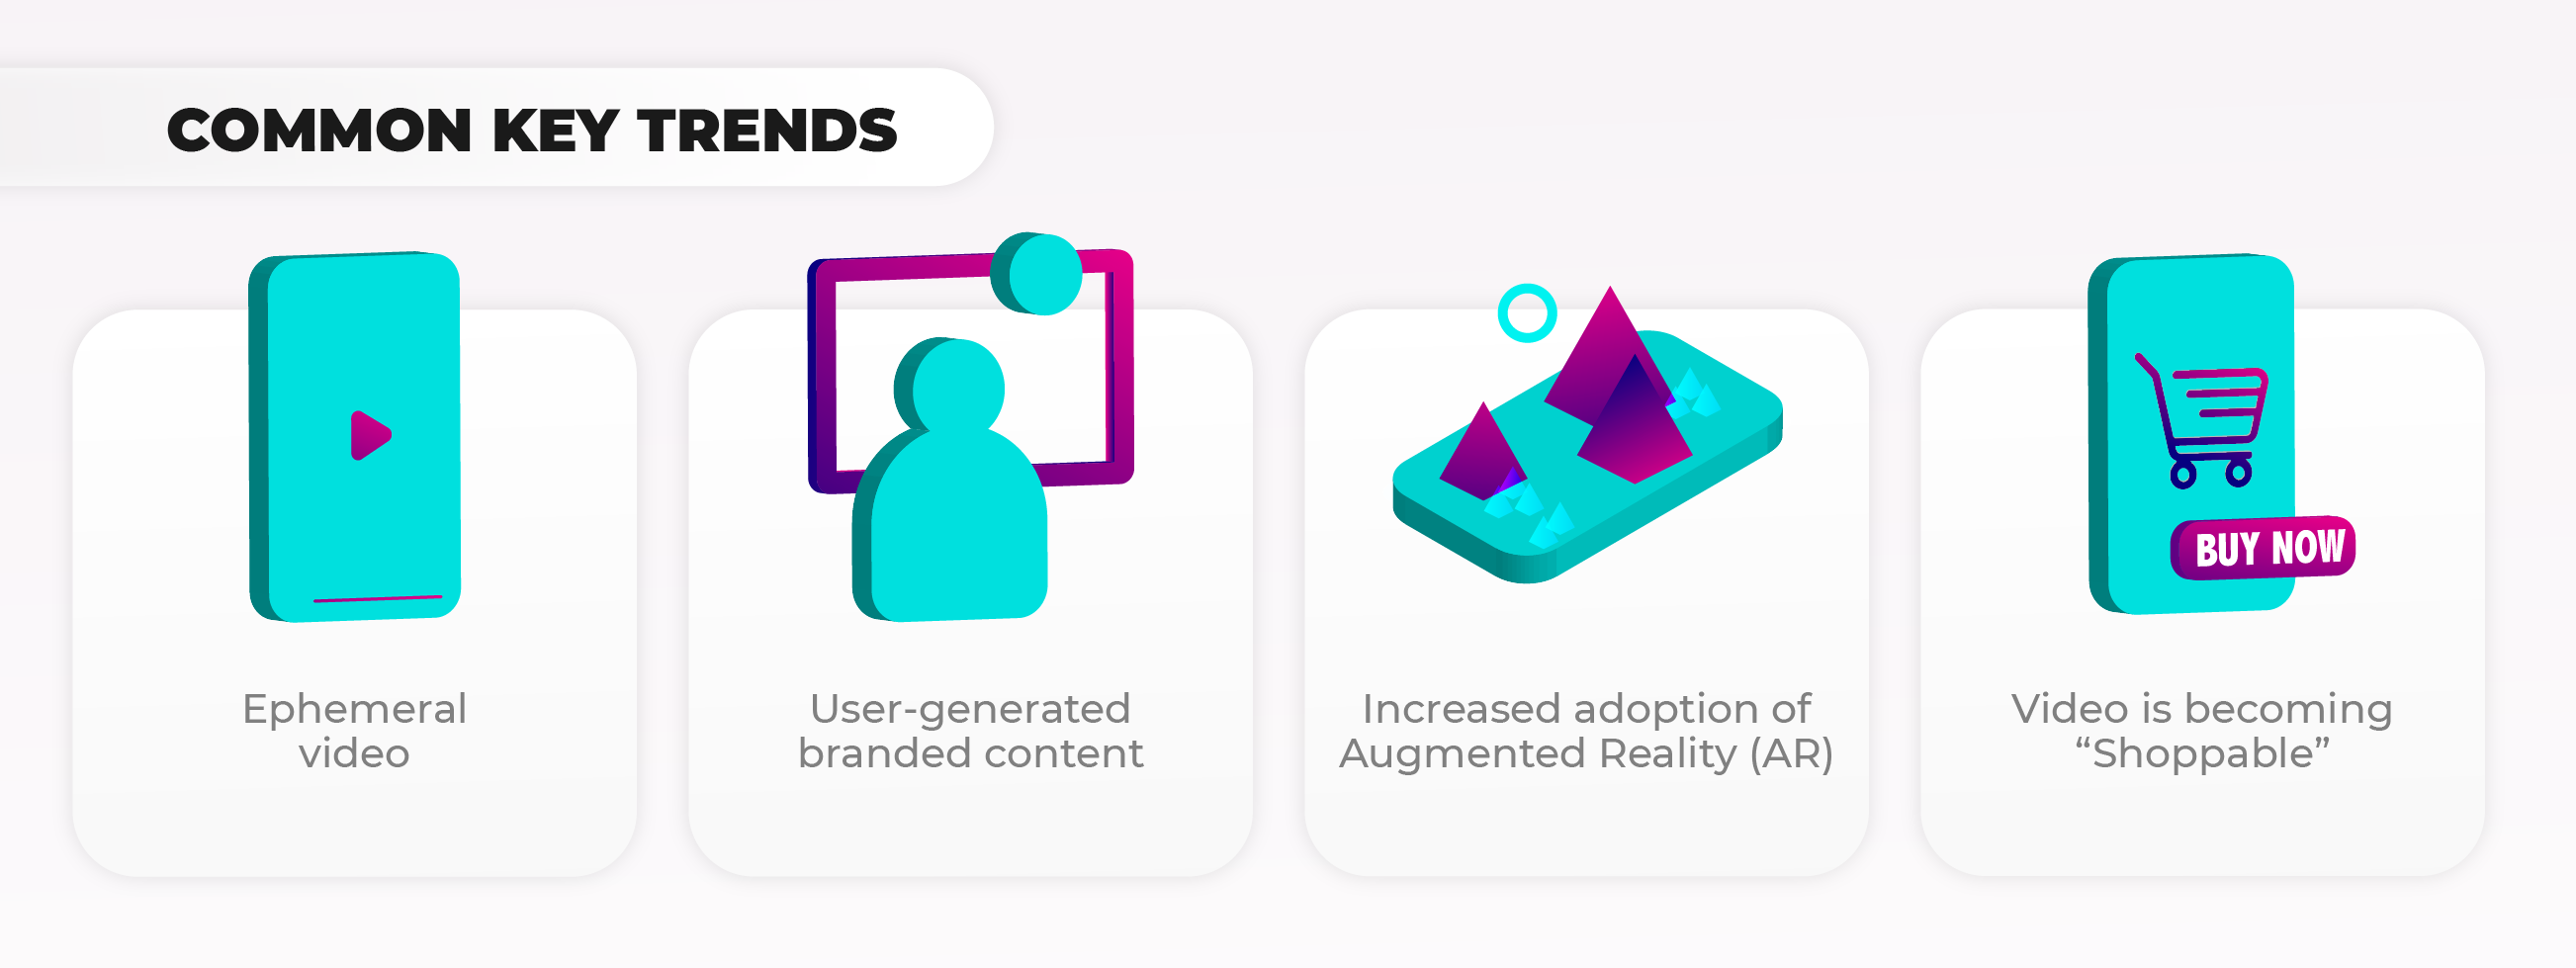 Common video trends 2021